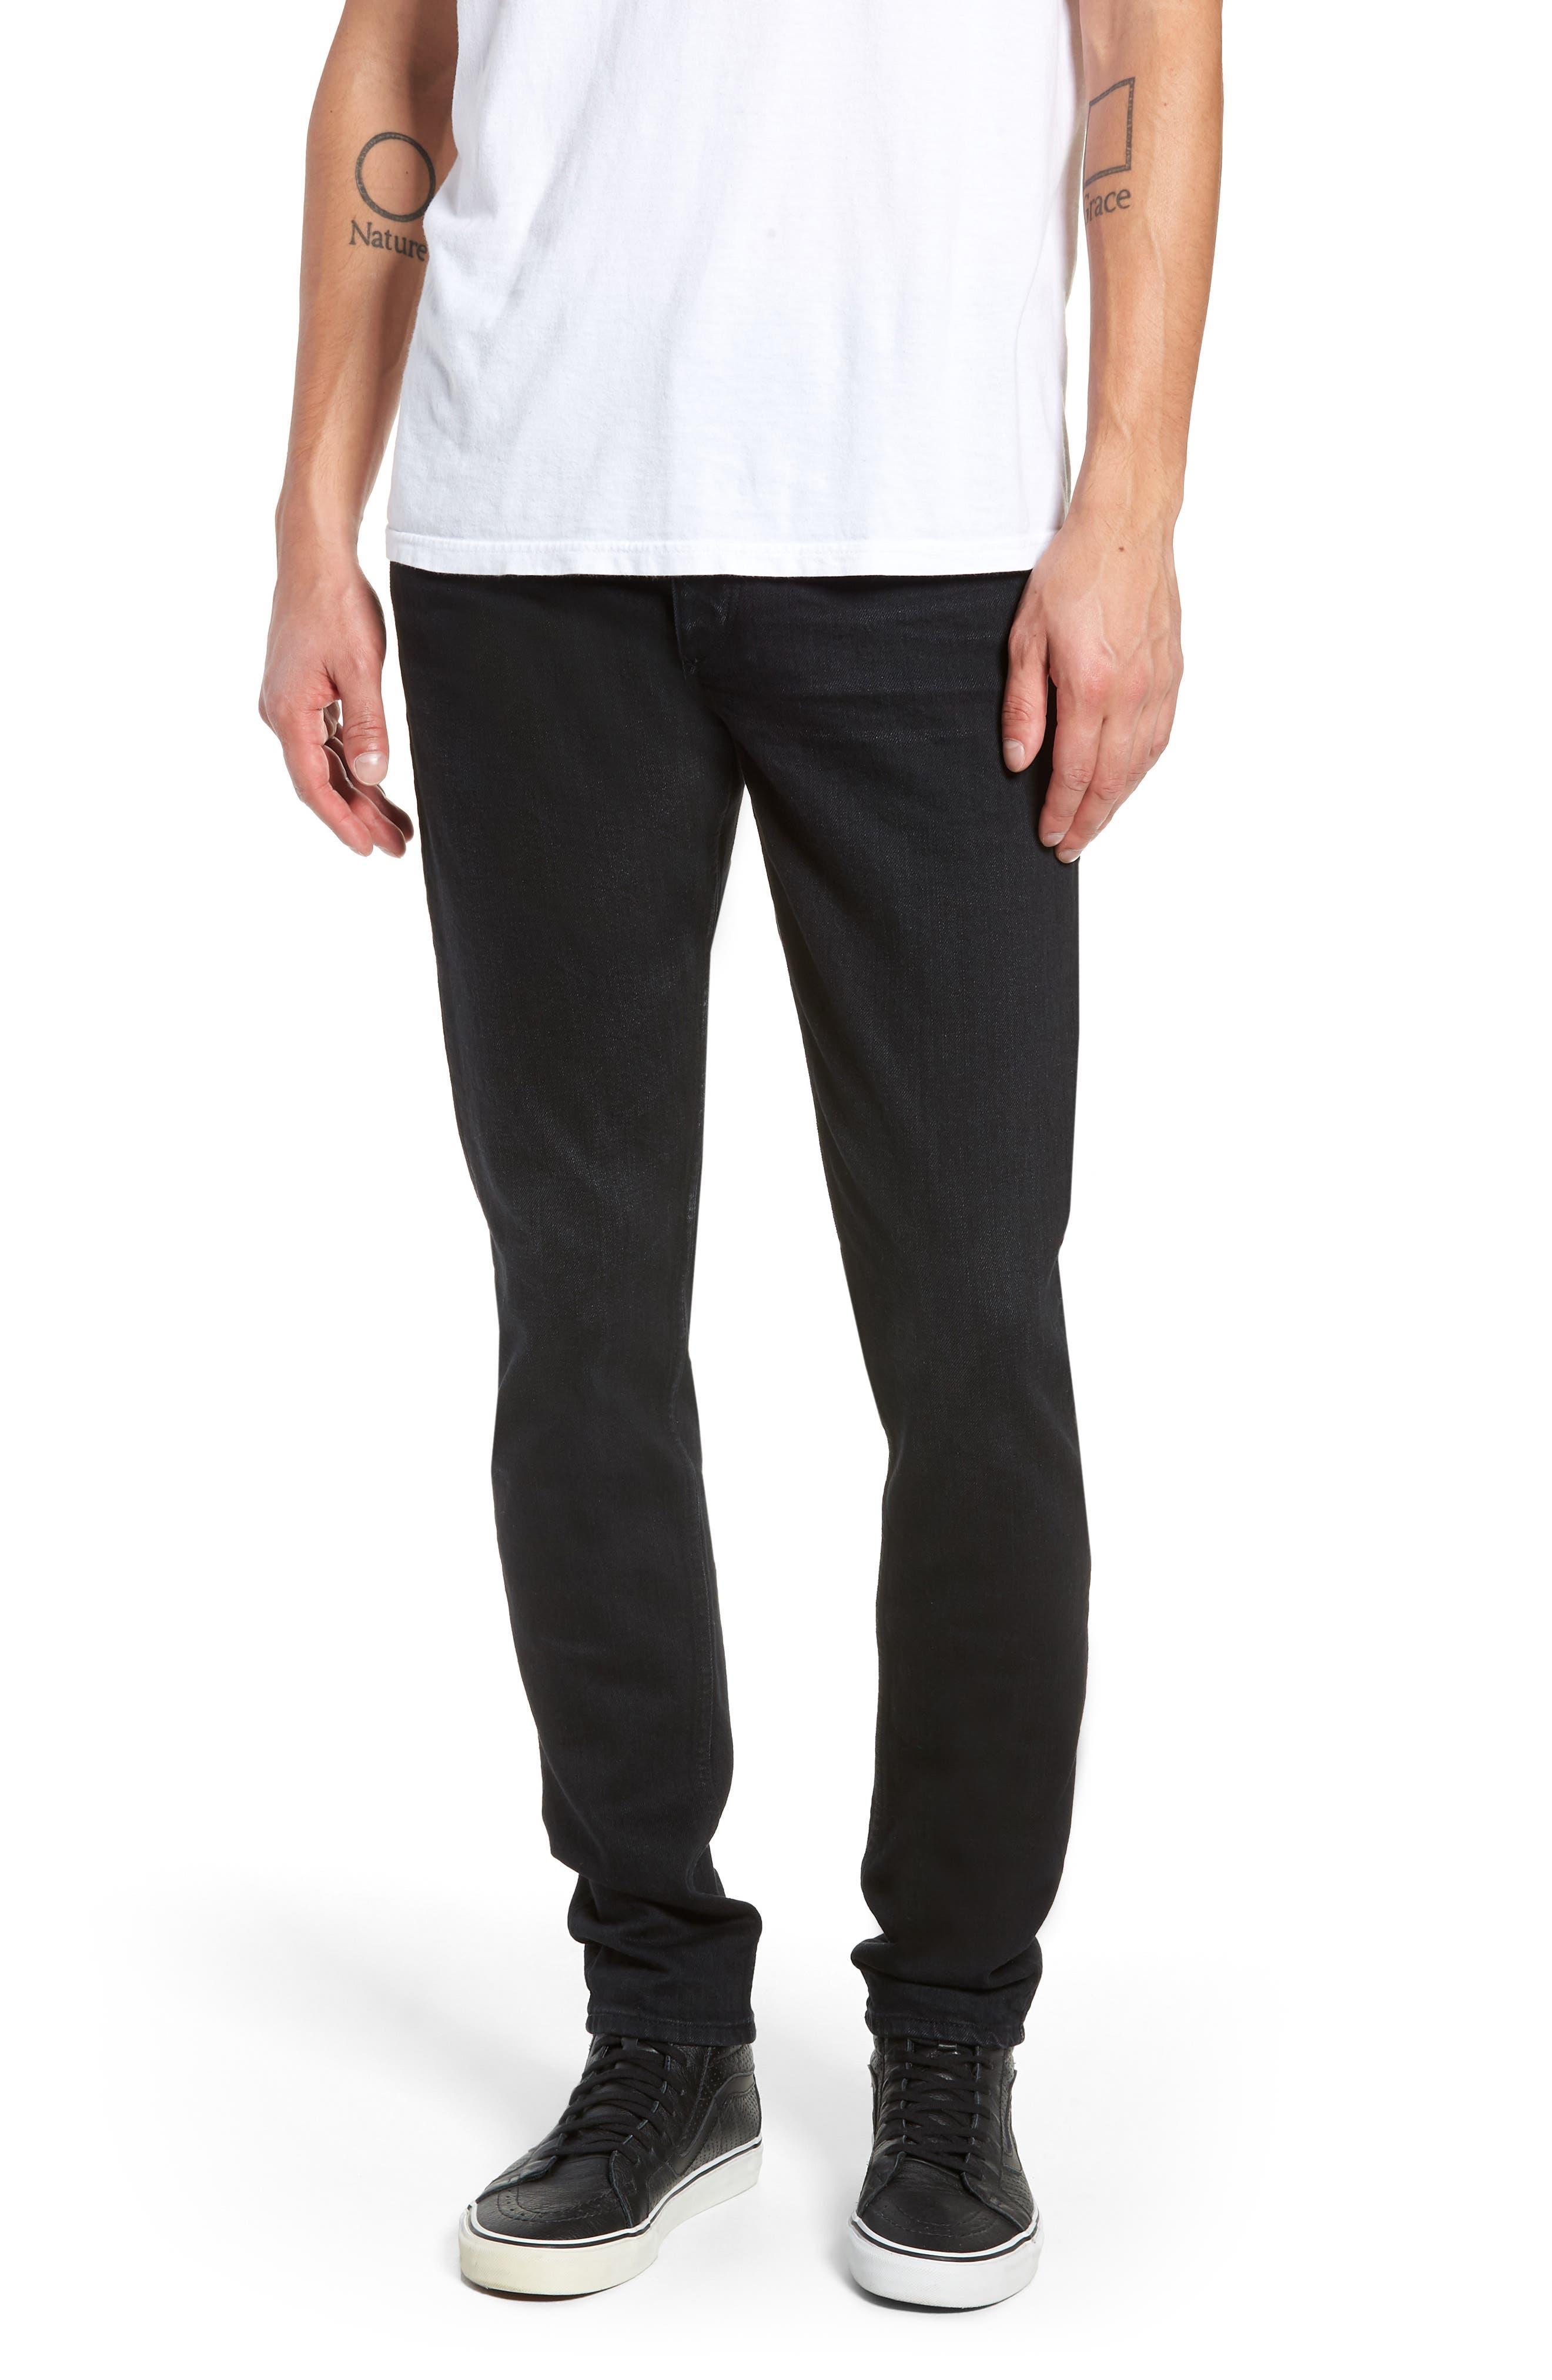 Fit 1 Skinny Fit Jeans,                         Main,                         color, DEVON